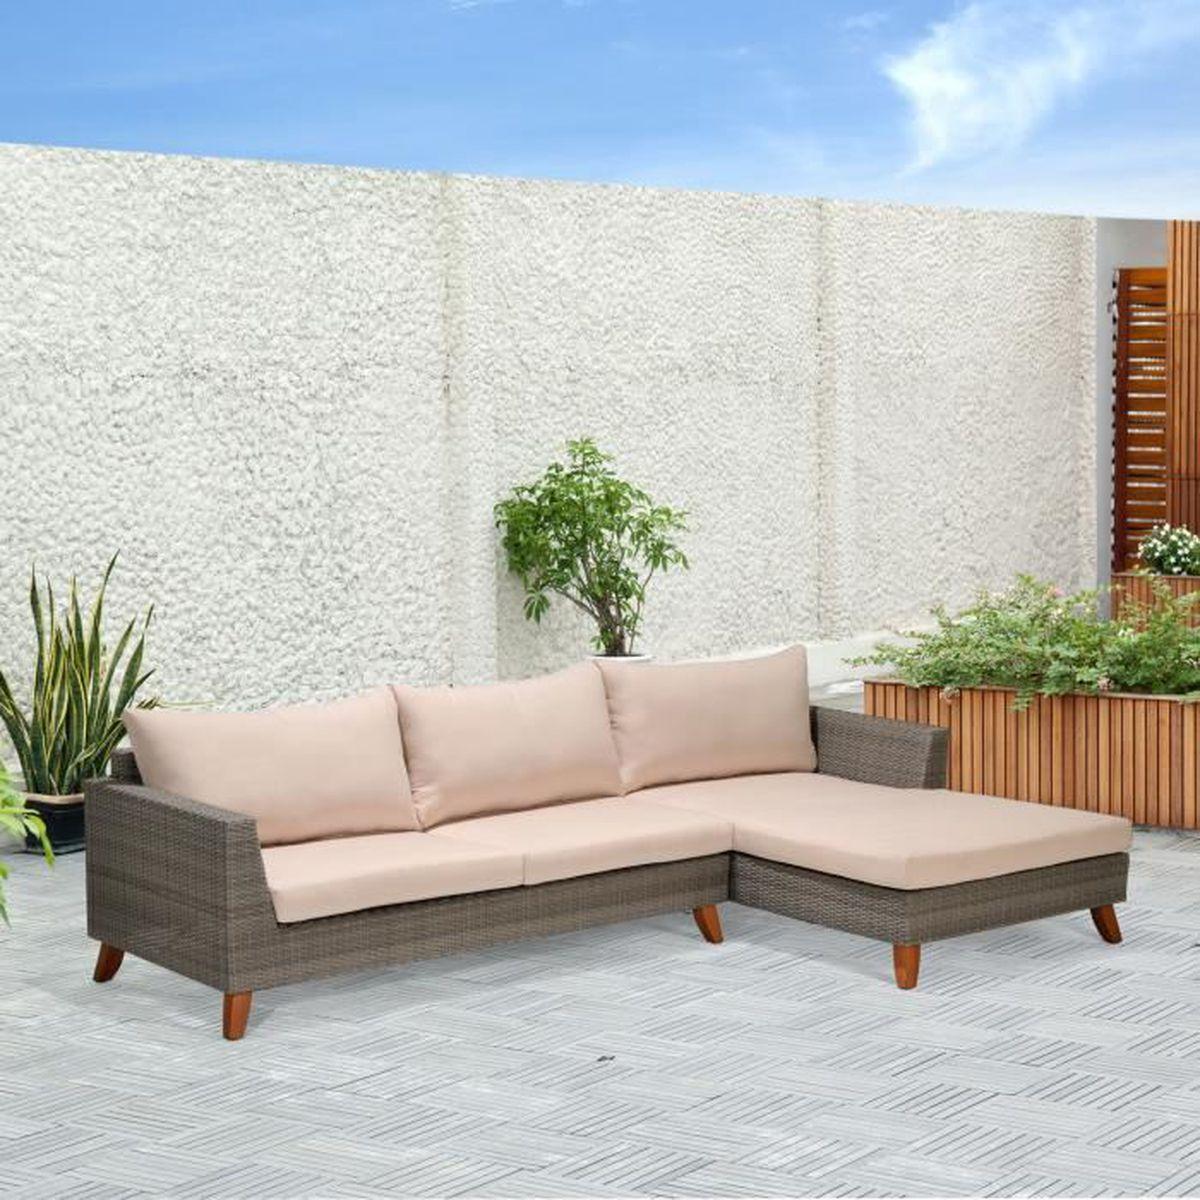 Palawan Salon de jardin gris effet rotin tressé (4 à 6 ...